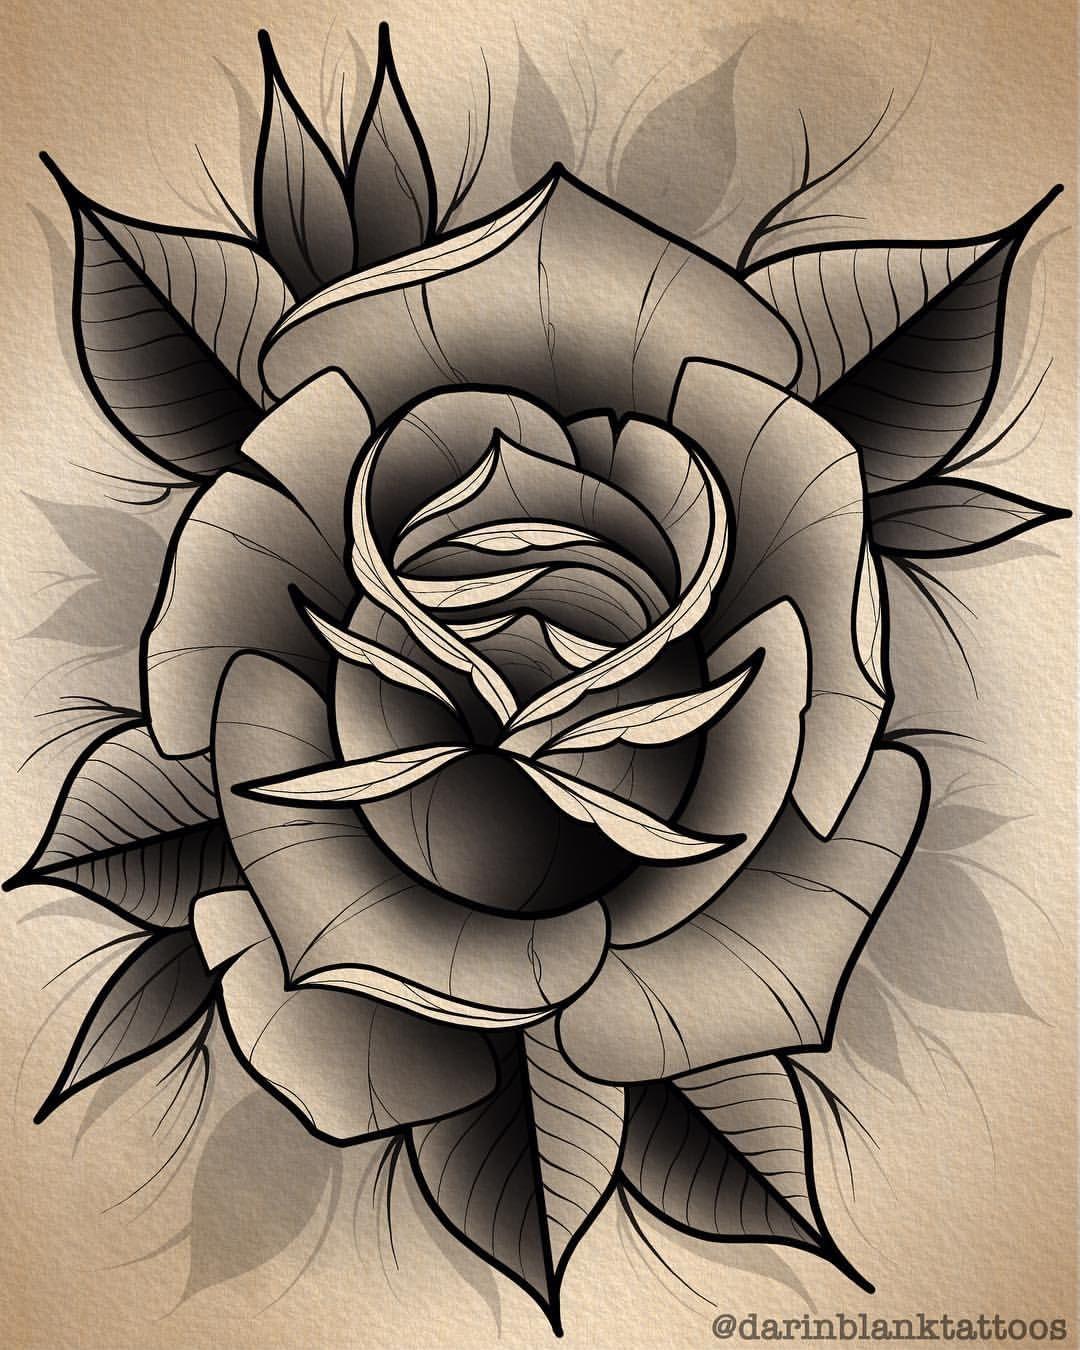 Rose Yo Happy Thanksgiving Everyone Tattoo Tattoos Tattooart Tattooartist Tatt Rose Flower Tattoos Traditional Rose Tattoos Rose Drawing Tattoo